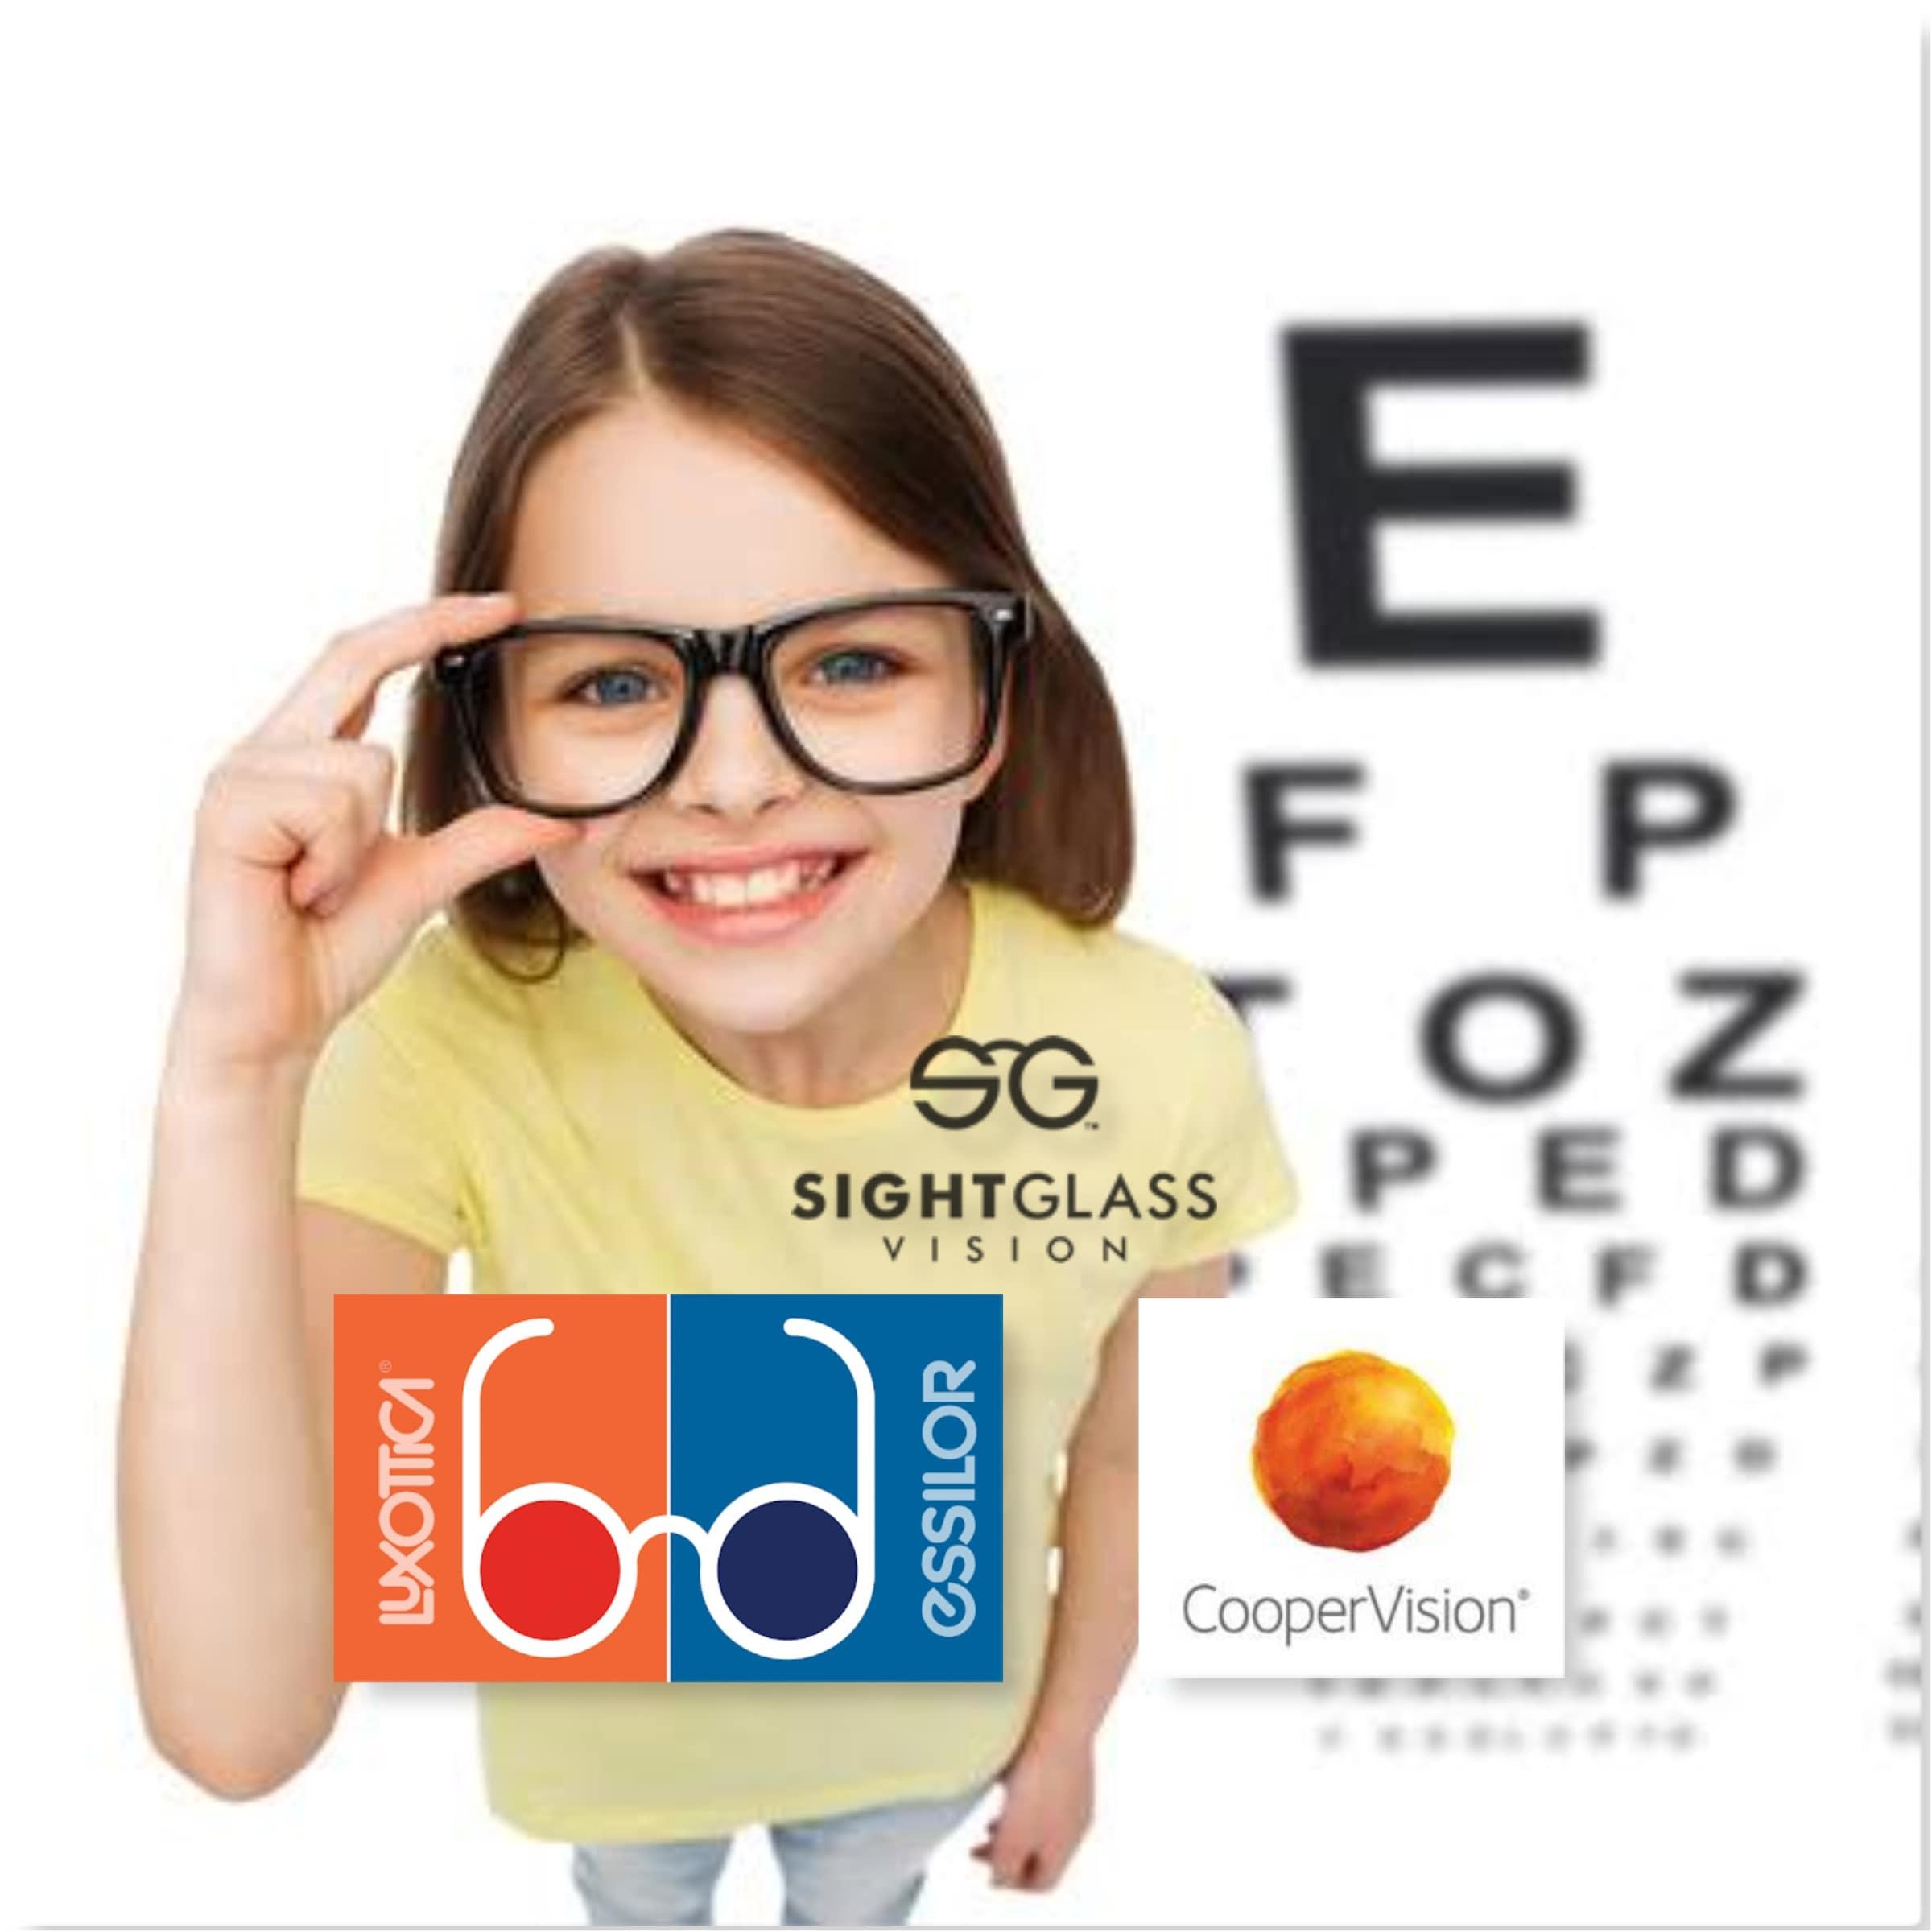 essilorluxottica_cooper vision sightglass